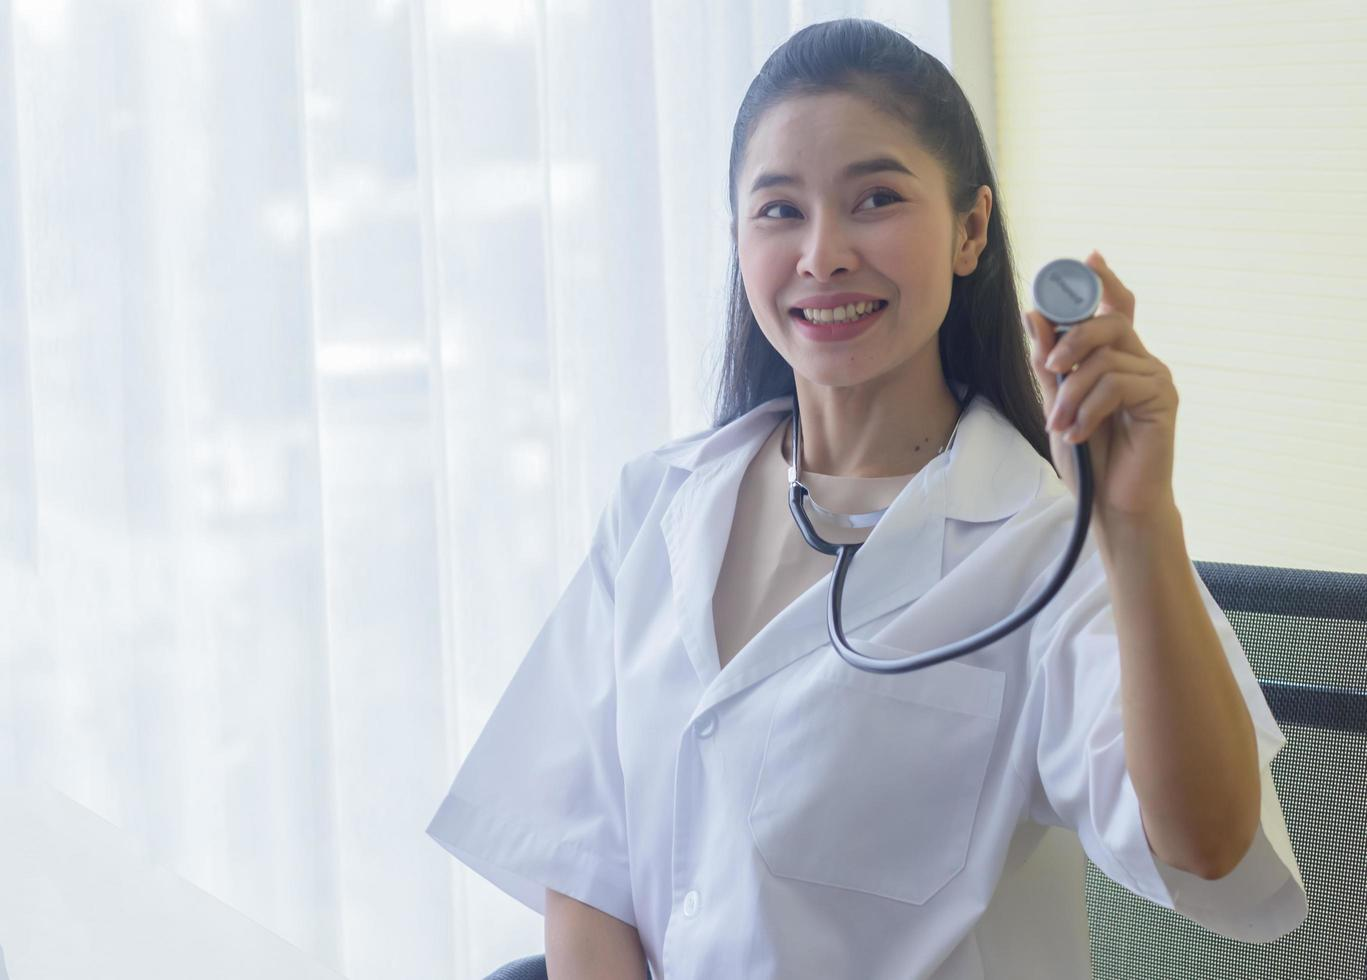 mooie jonge vrouw arts staat glimlachend foto